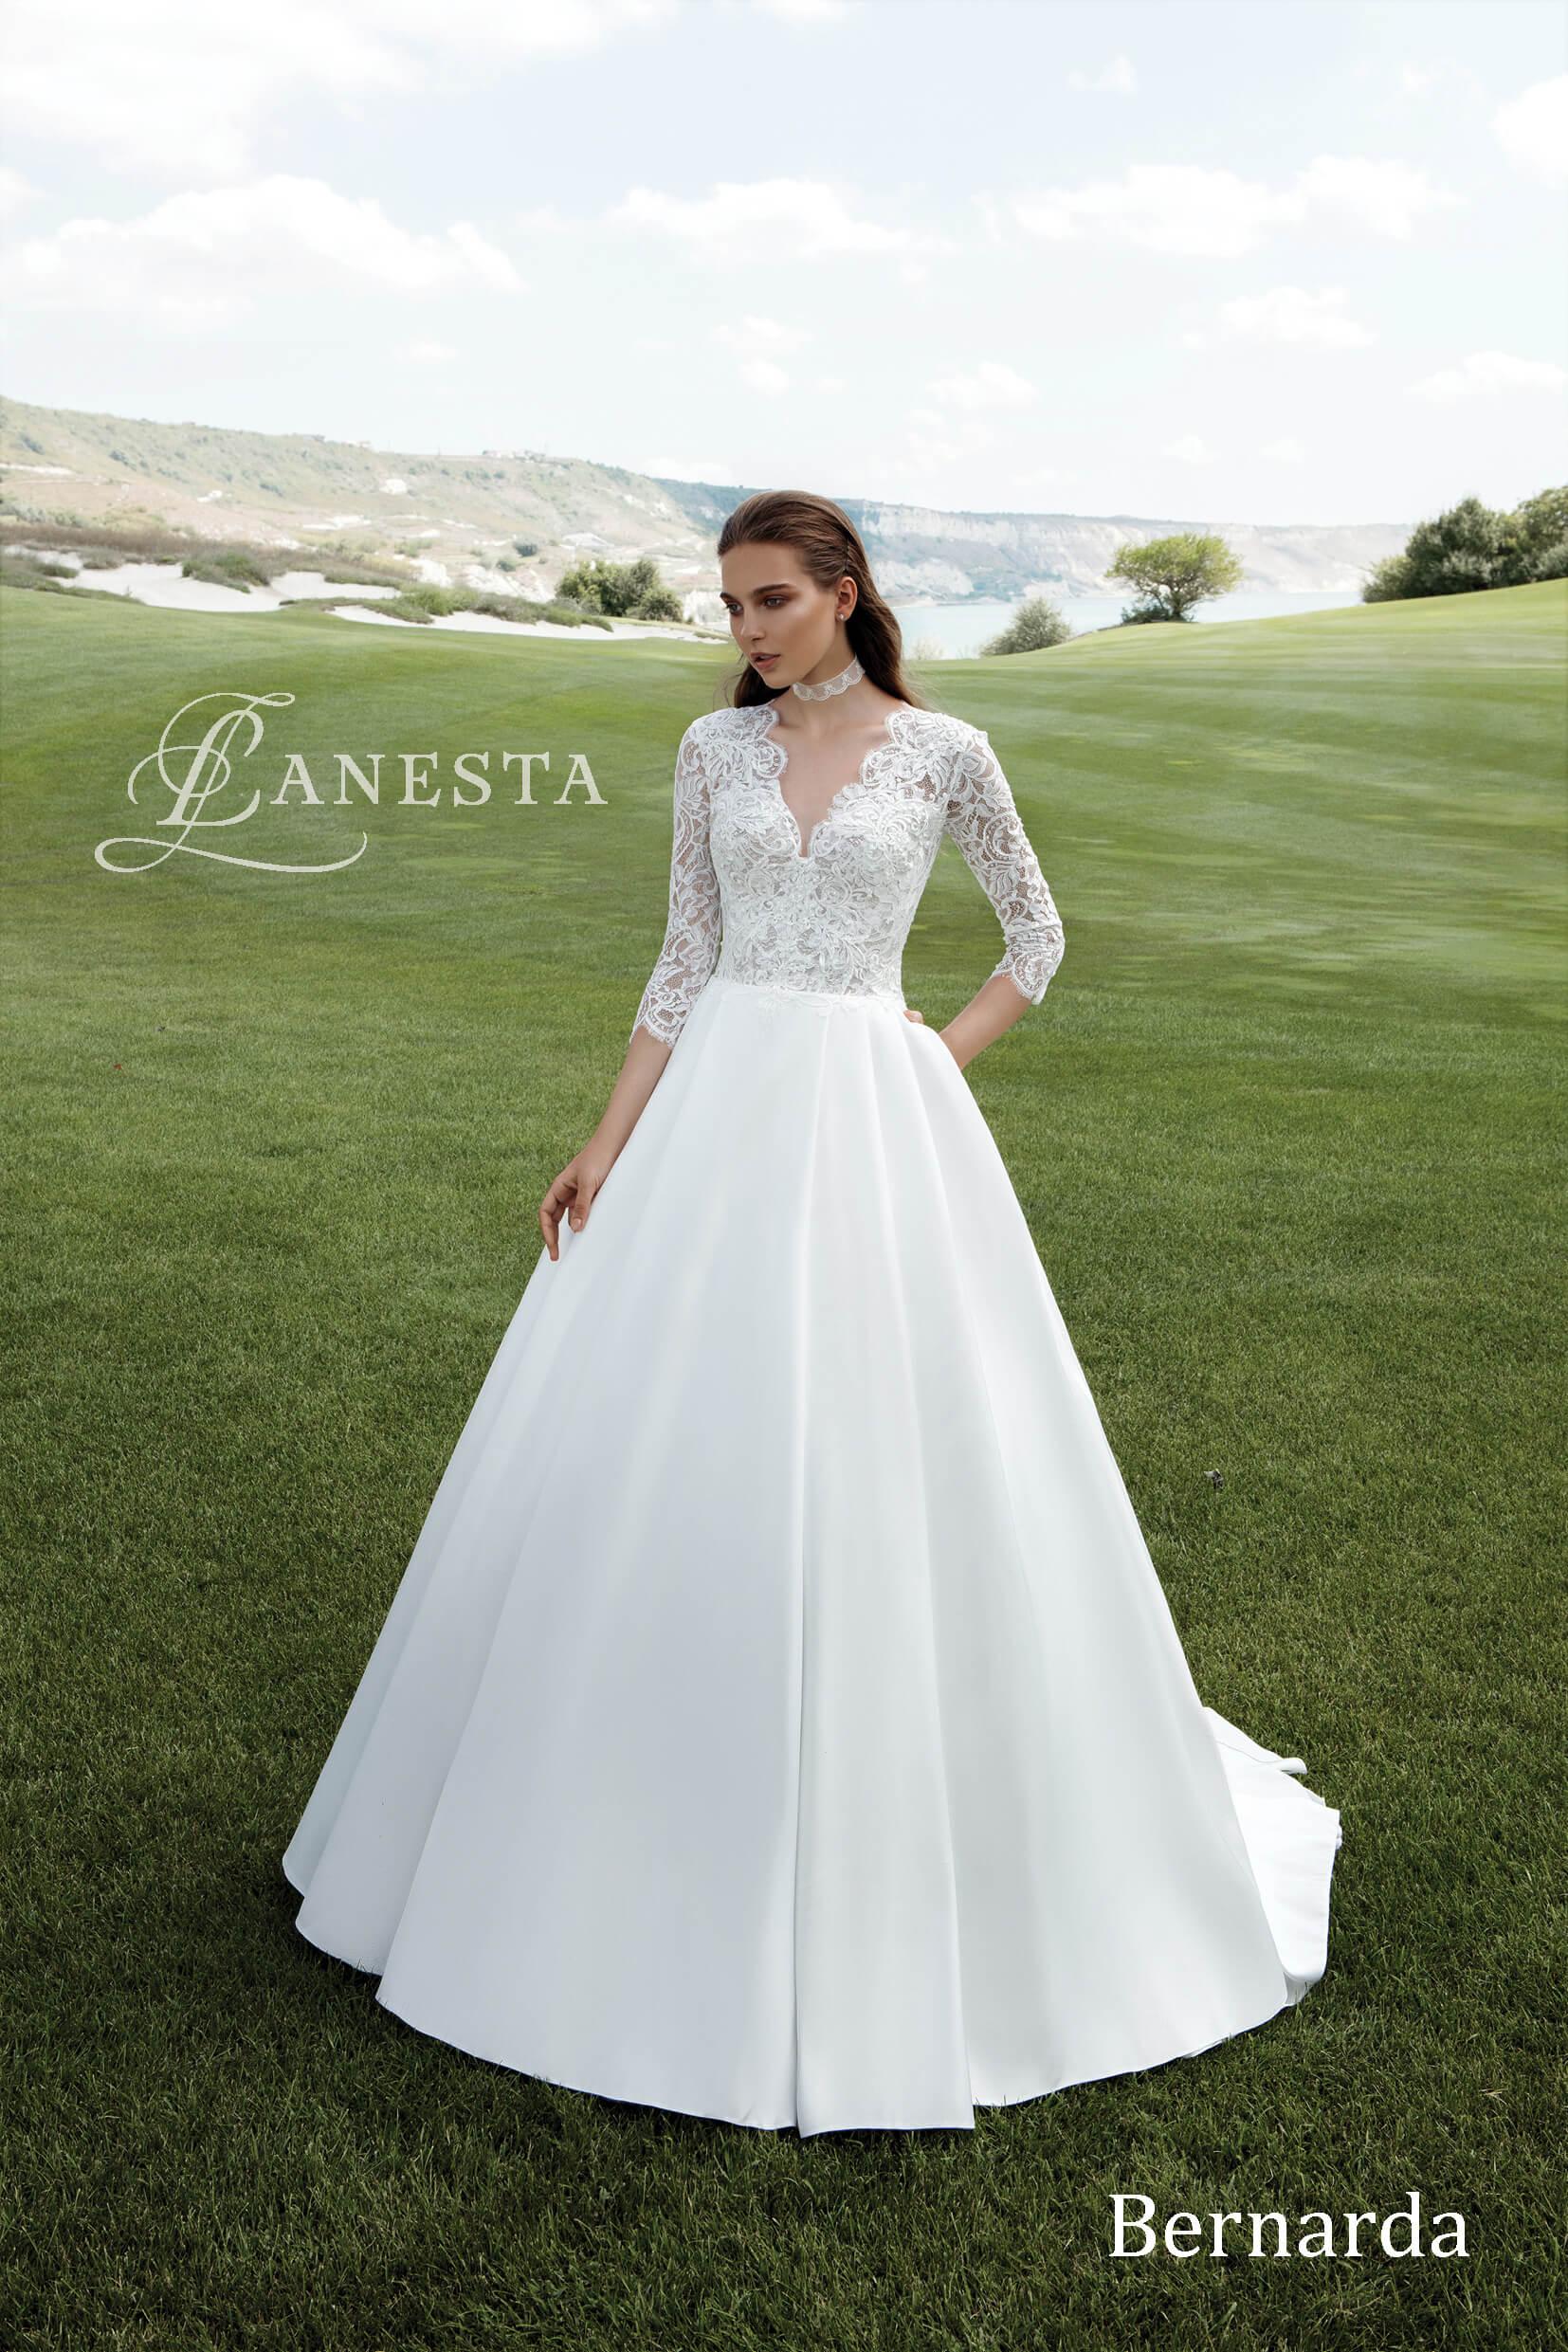 Весільна сукня Bernarda Lanesta